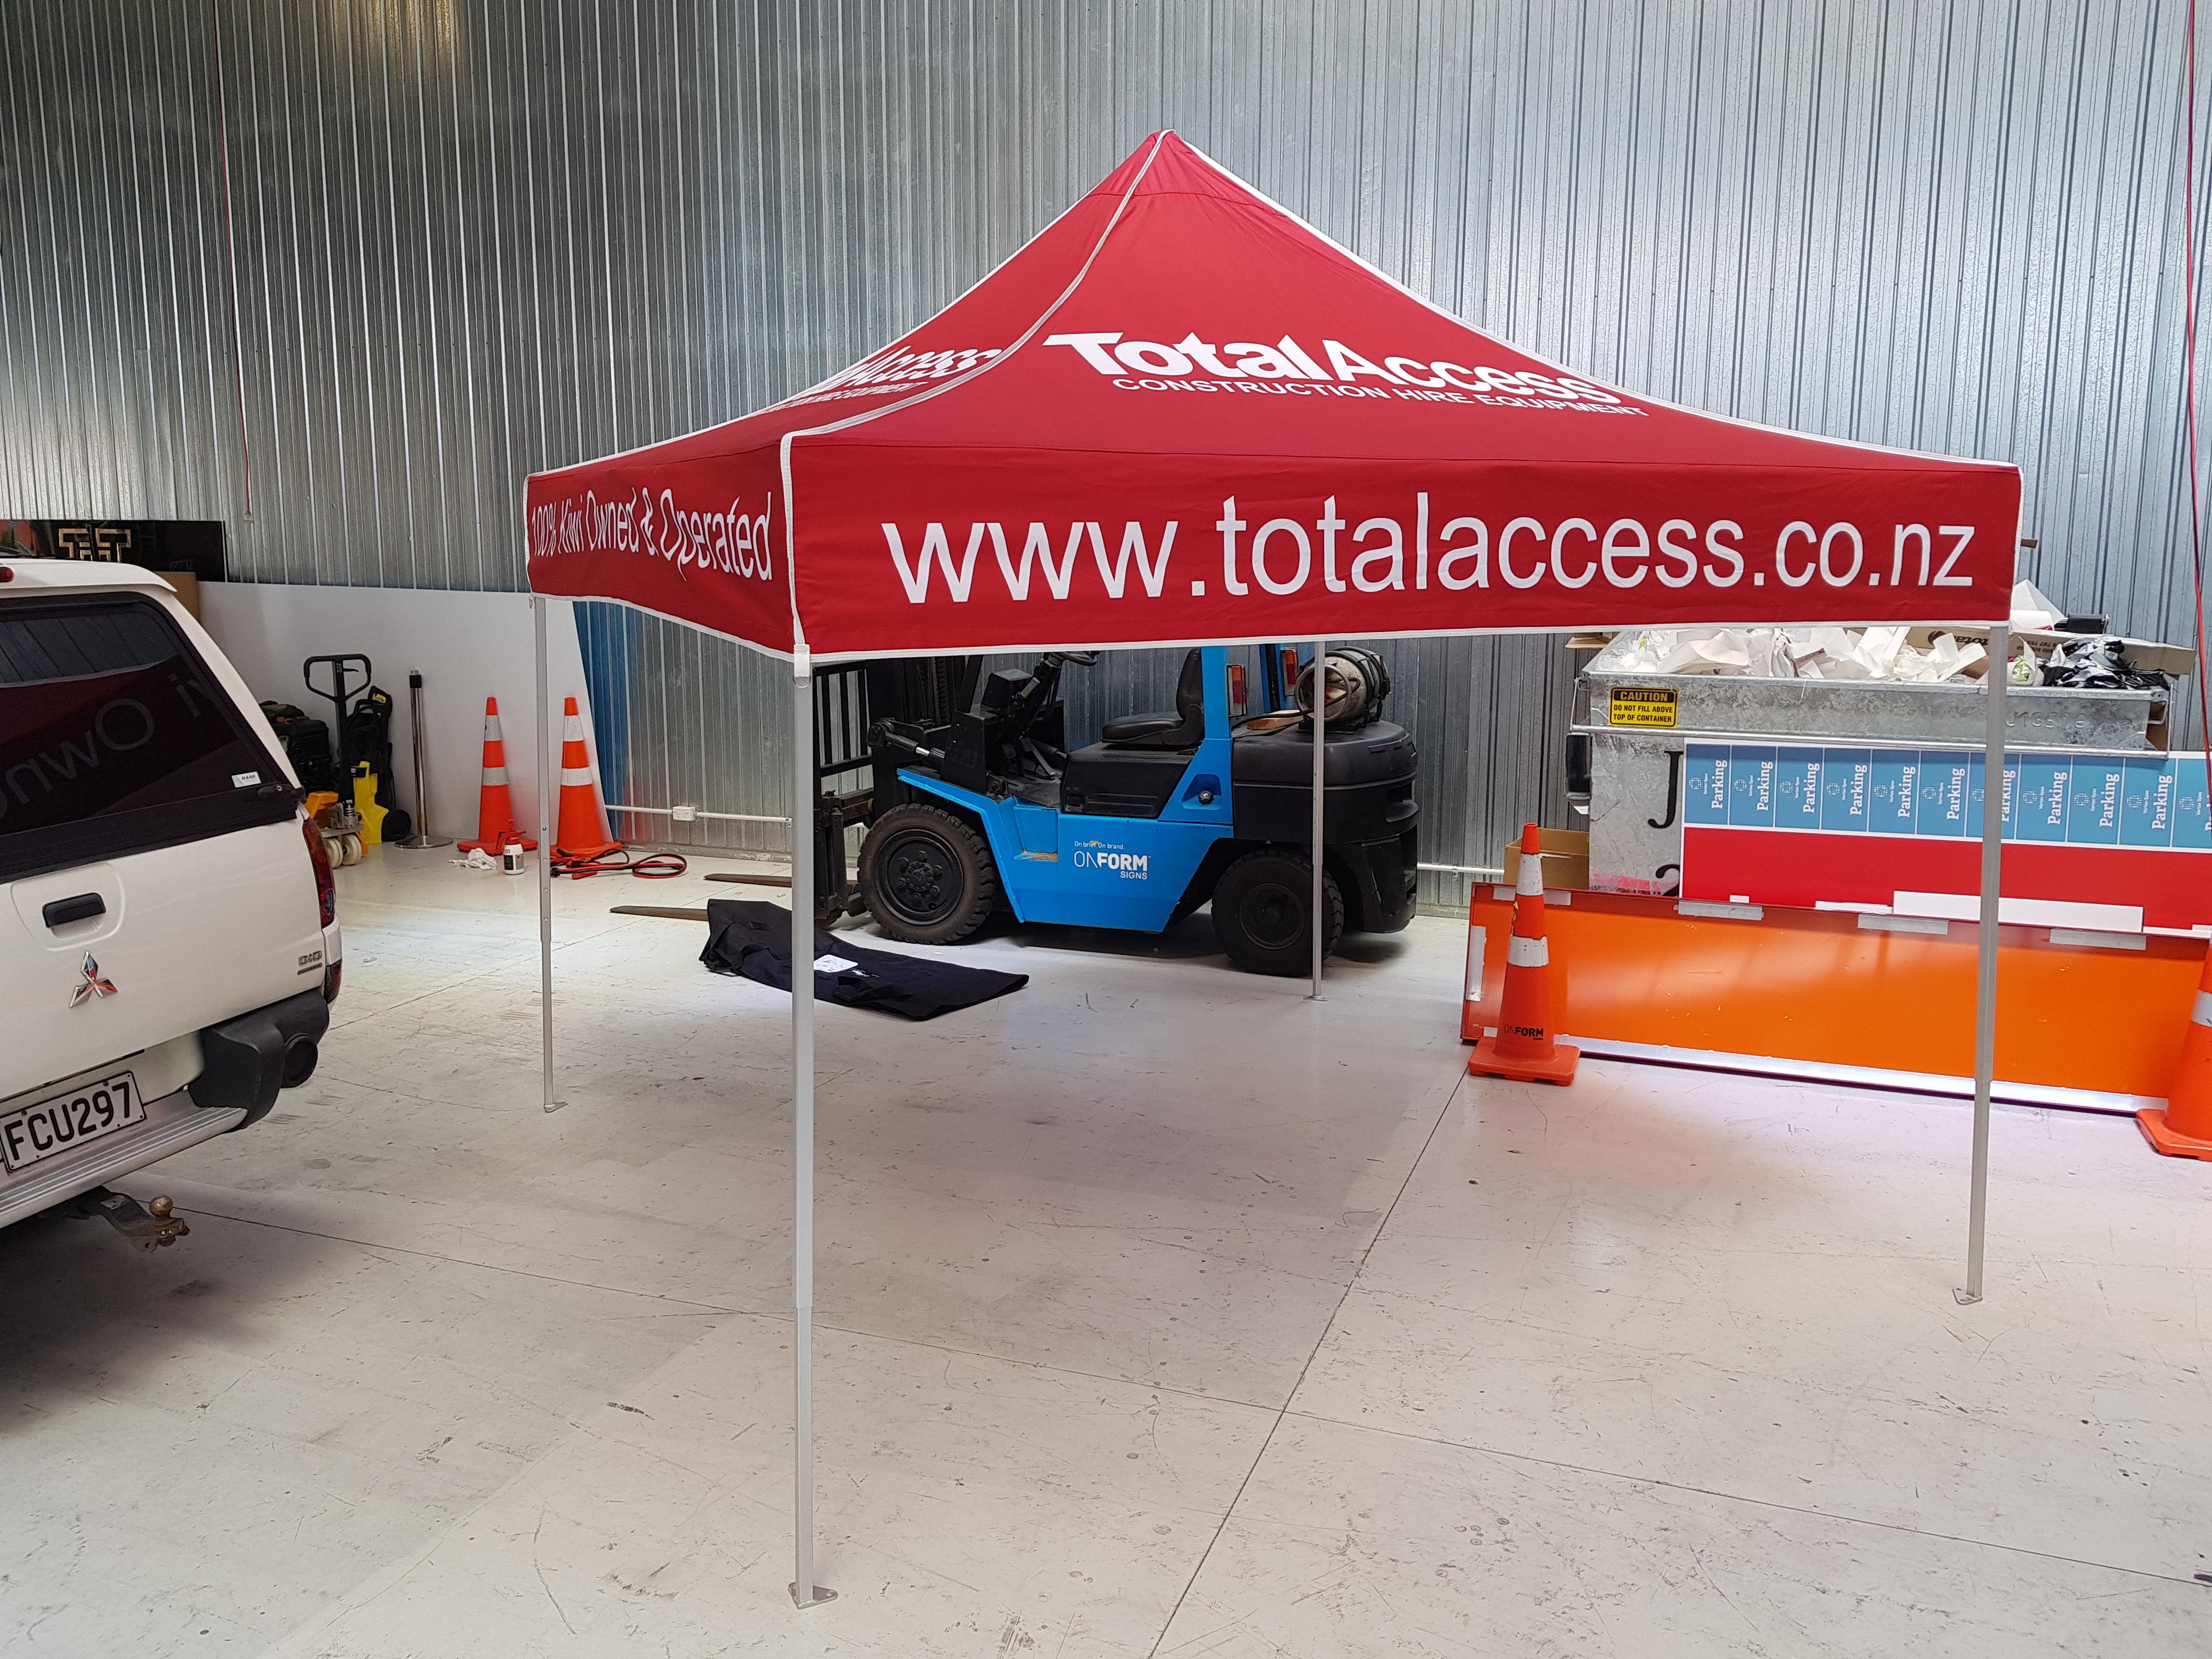 Total Access 3m x 3m